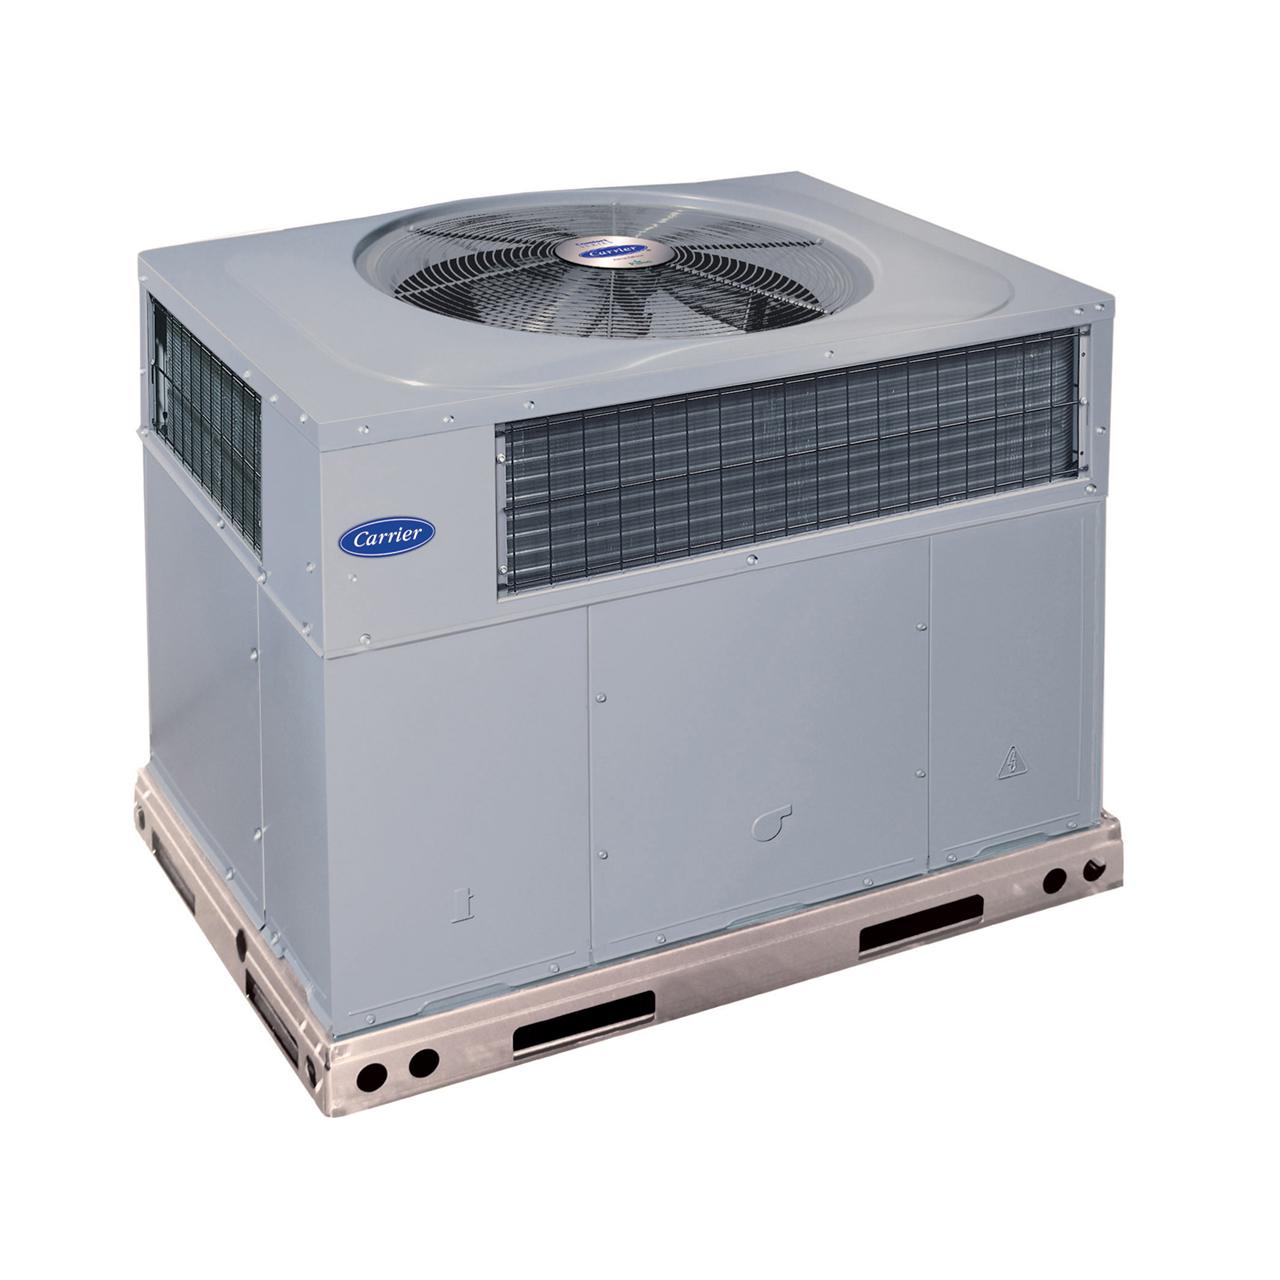 carrier-48ez-a-hybrid-heat-duel-fuel-outdoor-system